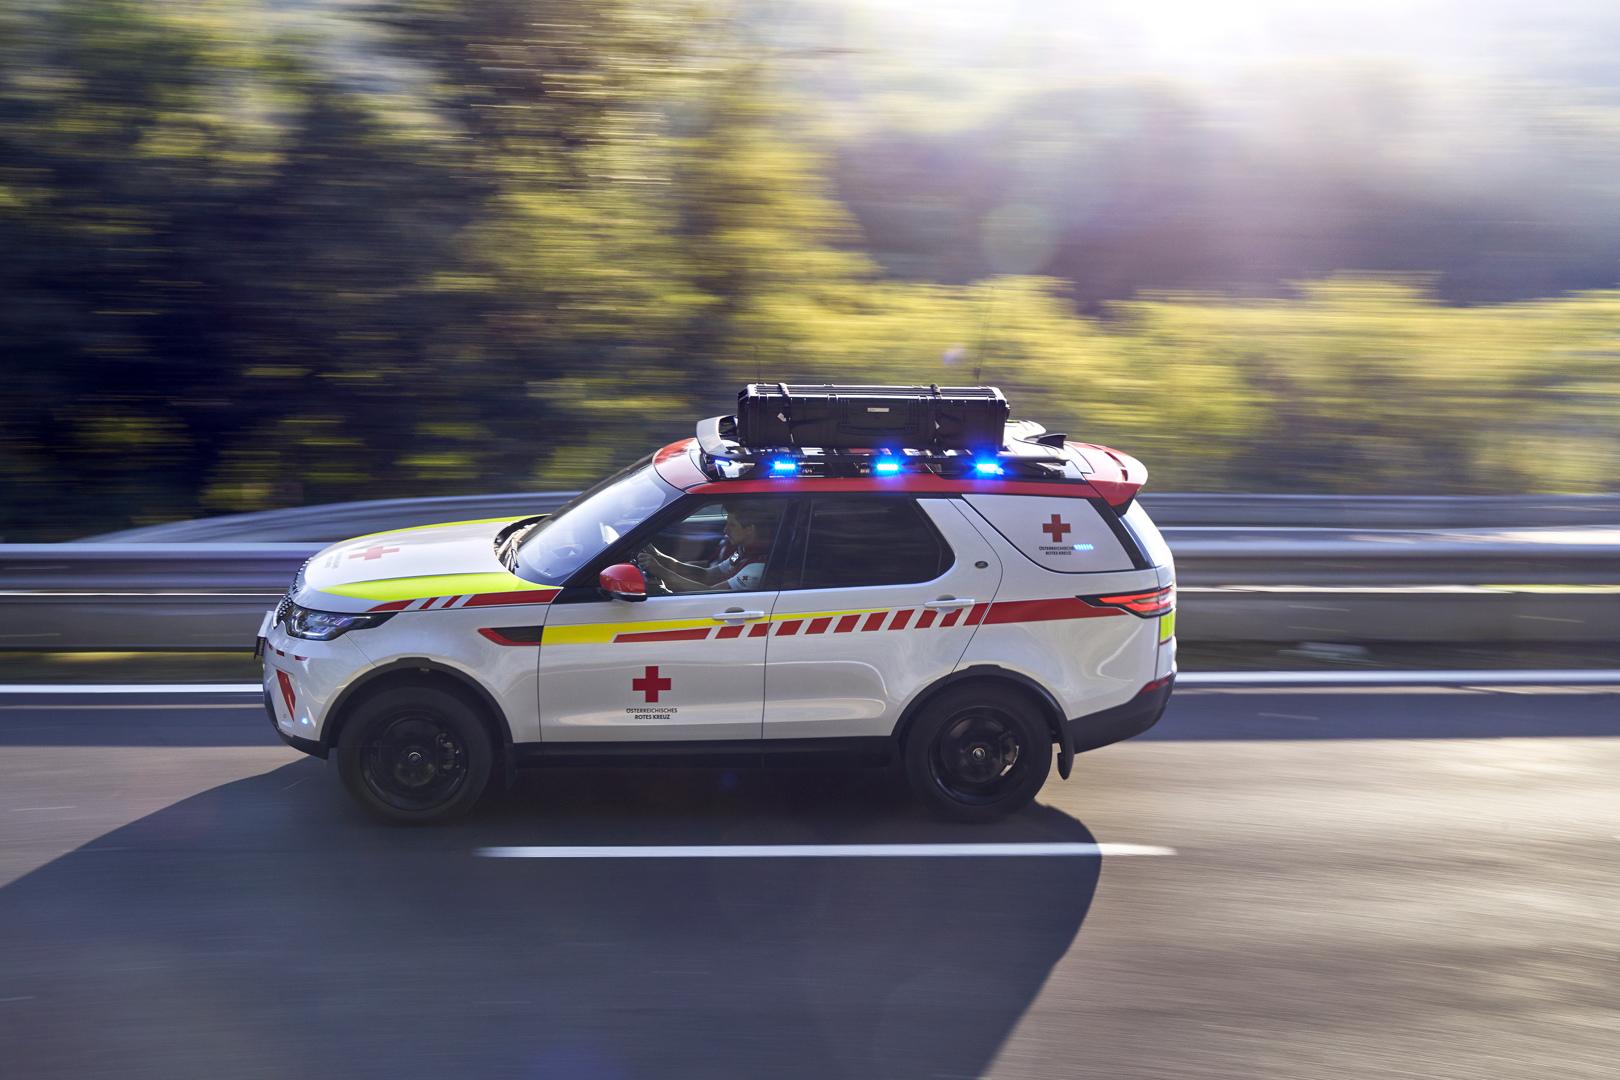 lrdiscoveryredcrossemergencyresponsevehicle02101819